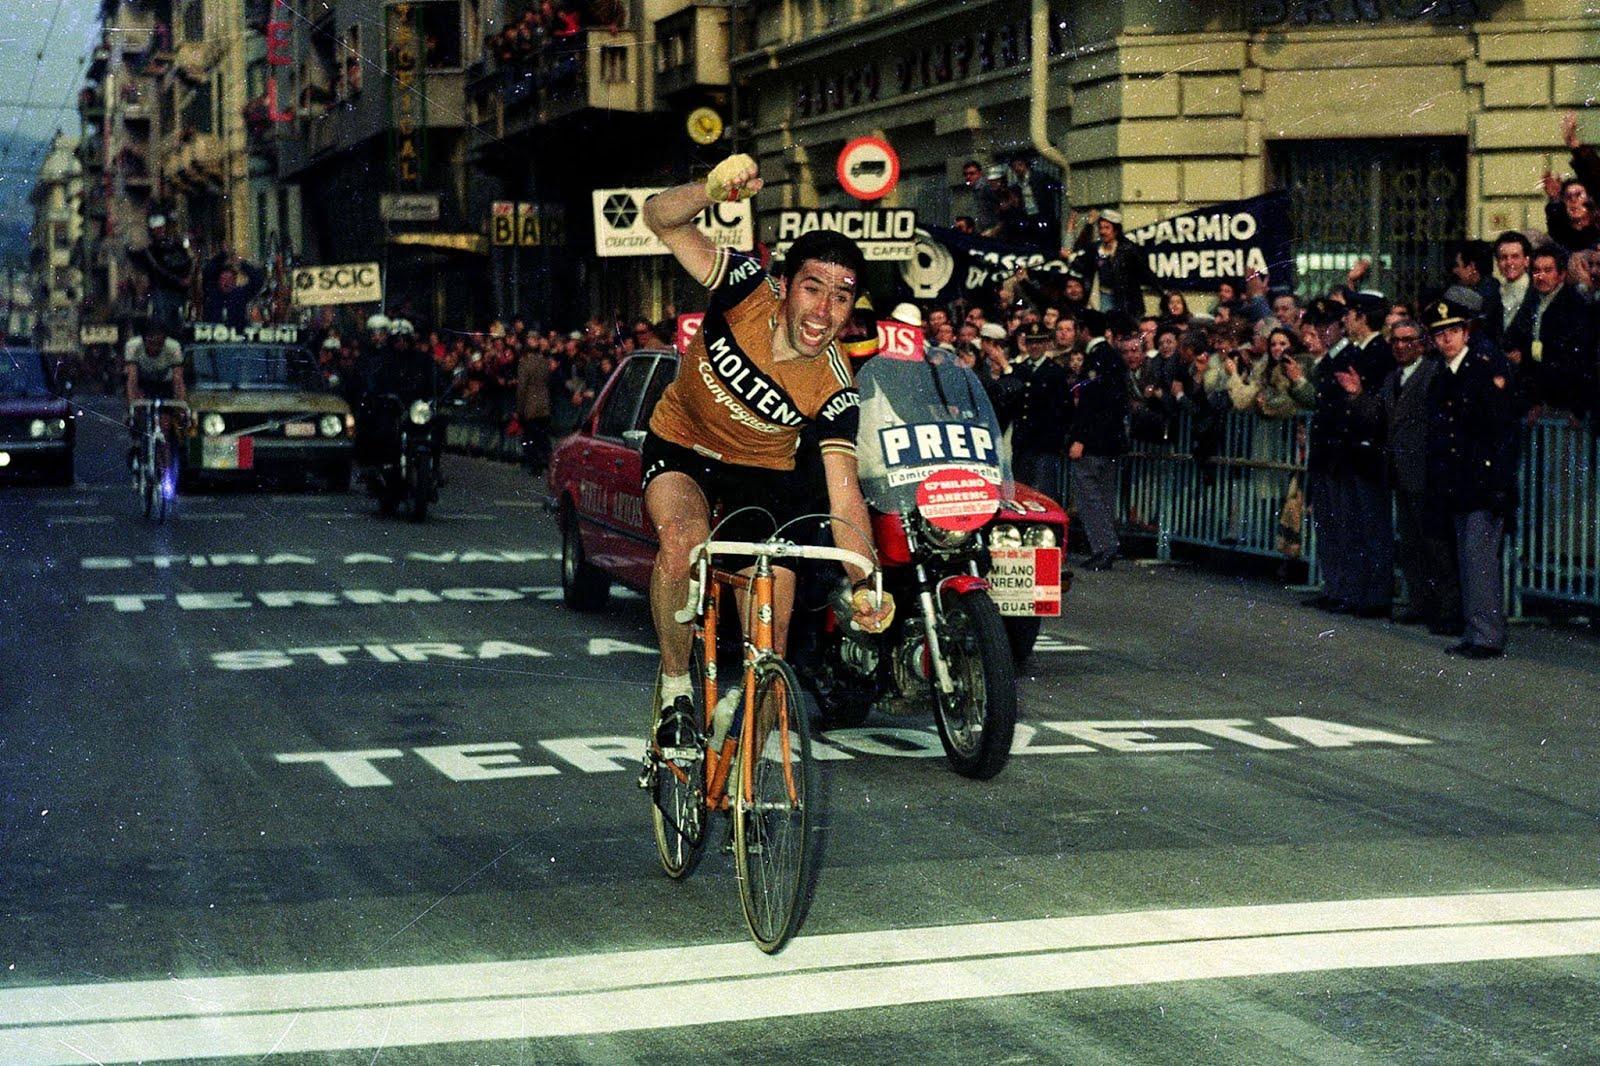 Eddy-Merckx-7th-Milan-San-Remo-victory.jpg